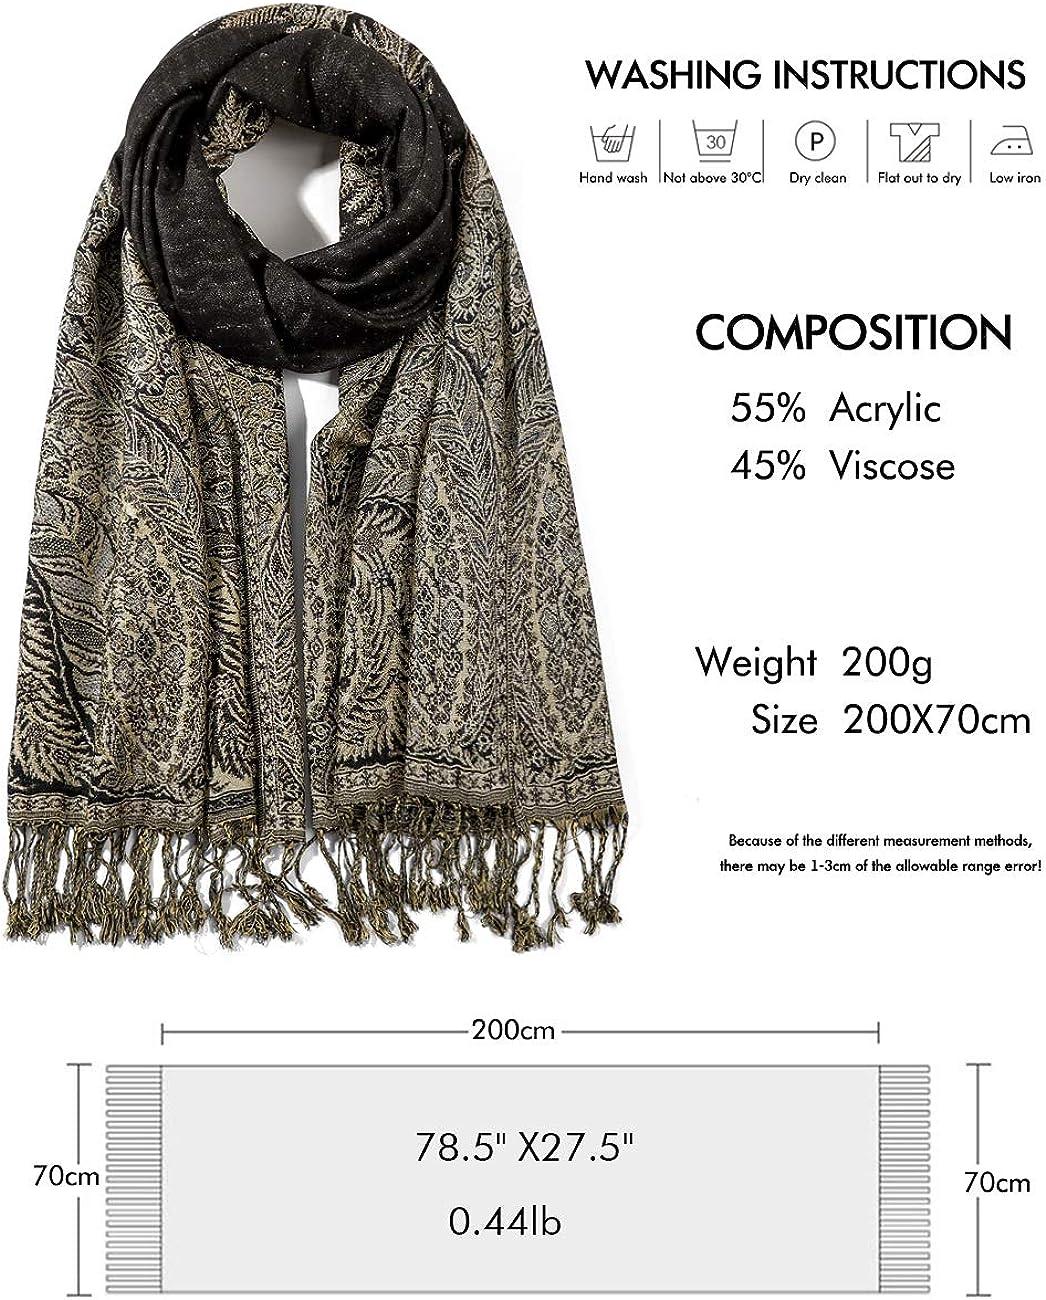 70cm Elegante Bufanda Estampada para Mujer Lujoso Chal C/álido con Borla Suave Pashmina Estilo Paisley /Étnico Uso en Oto/ño Invierno 200